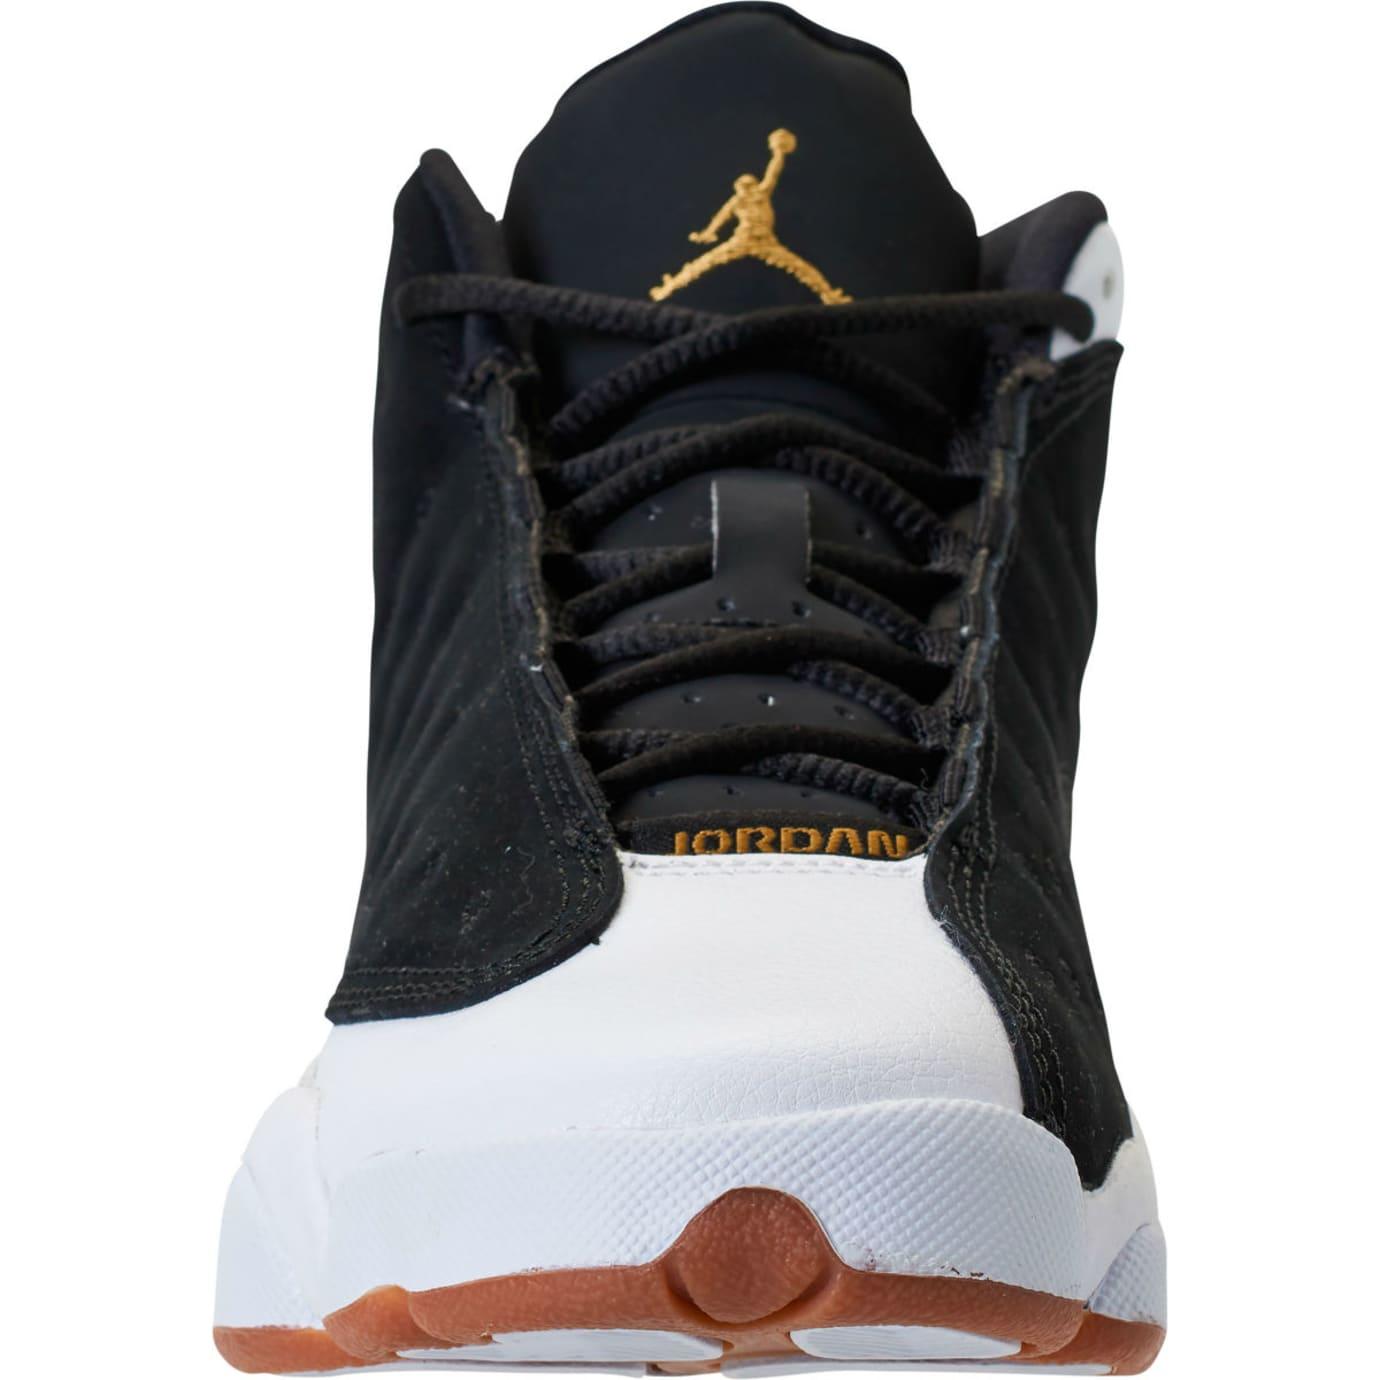 Air Jordan 13 Girls Black Gold White Gum Release Date 439358-021 Front